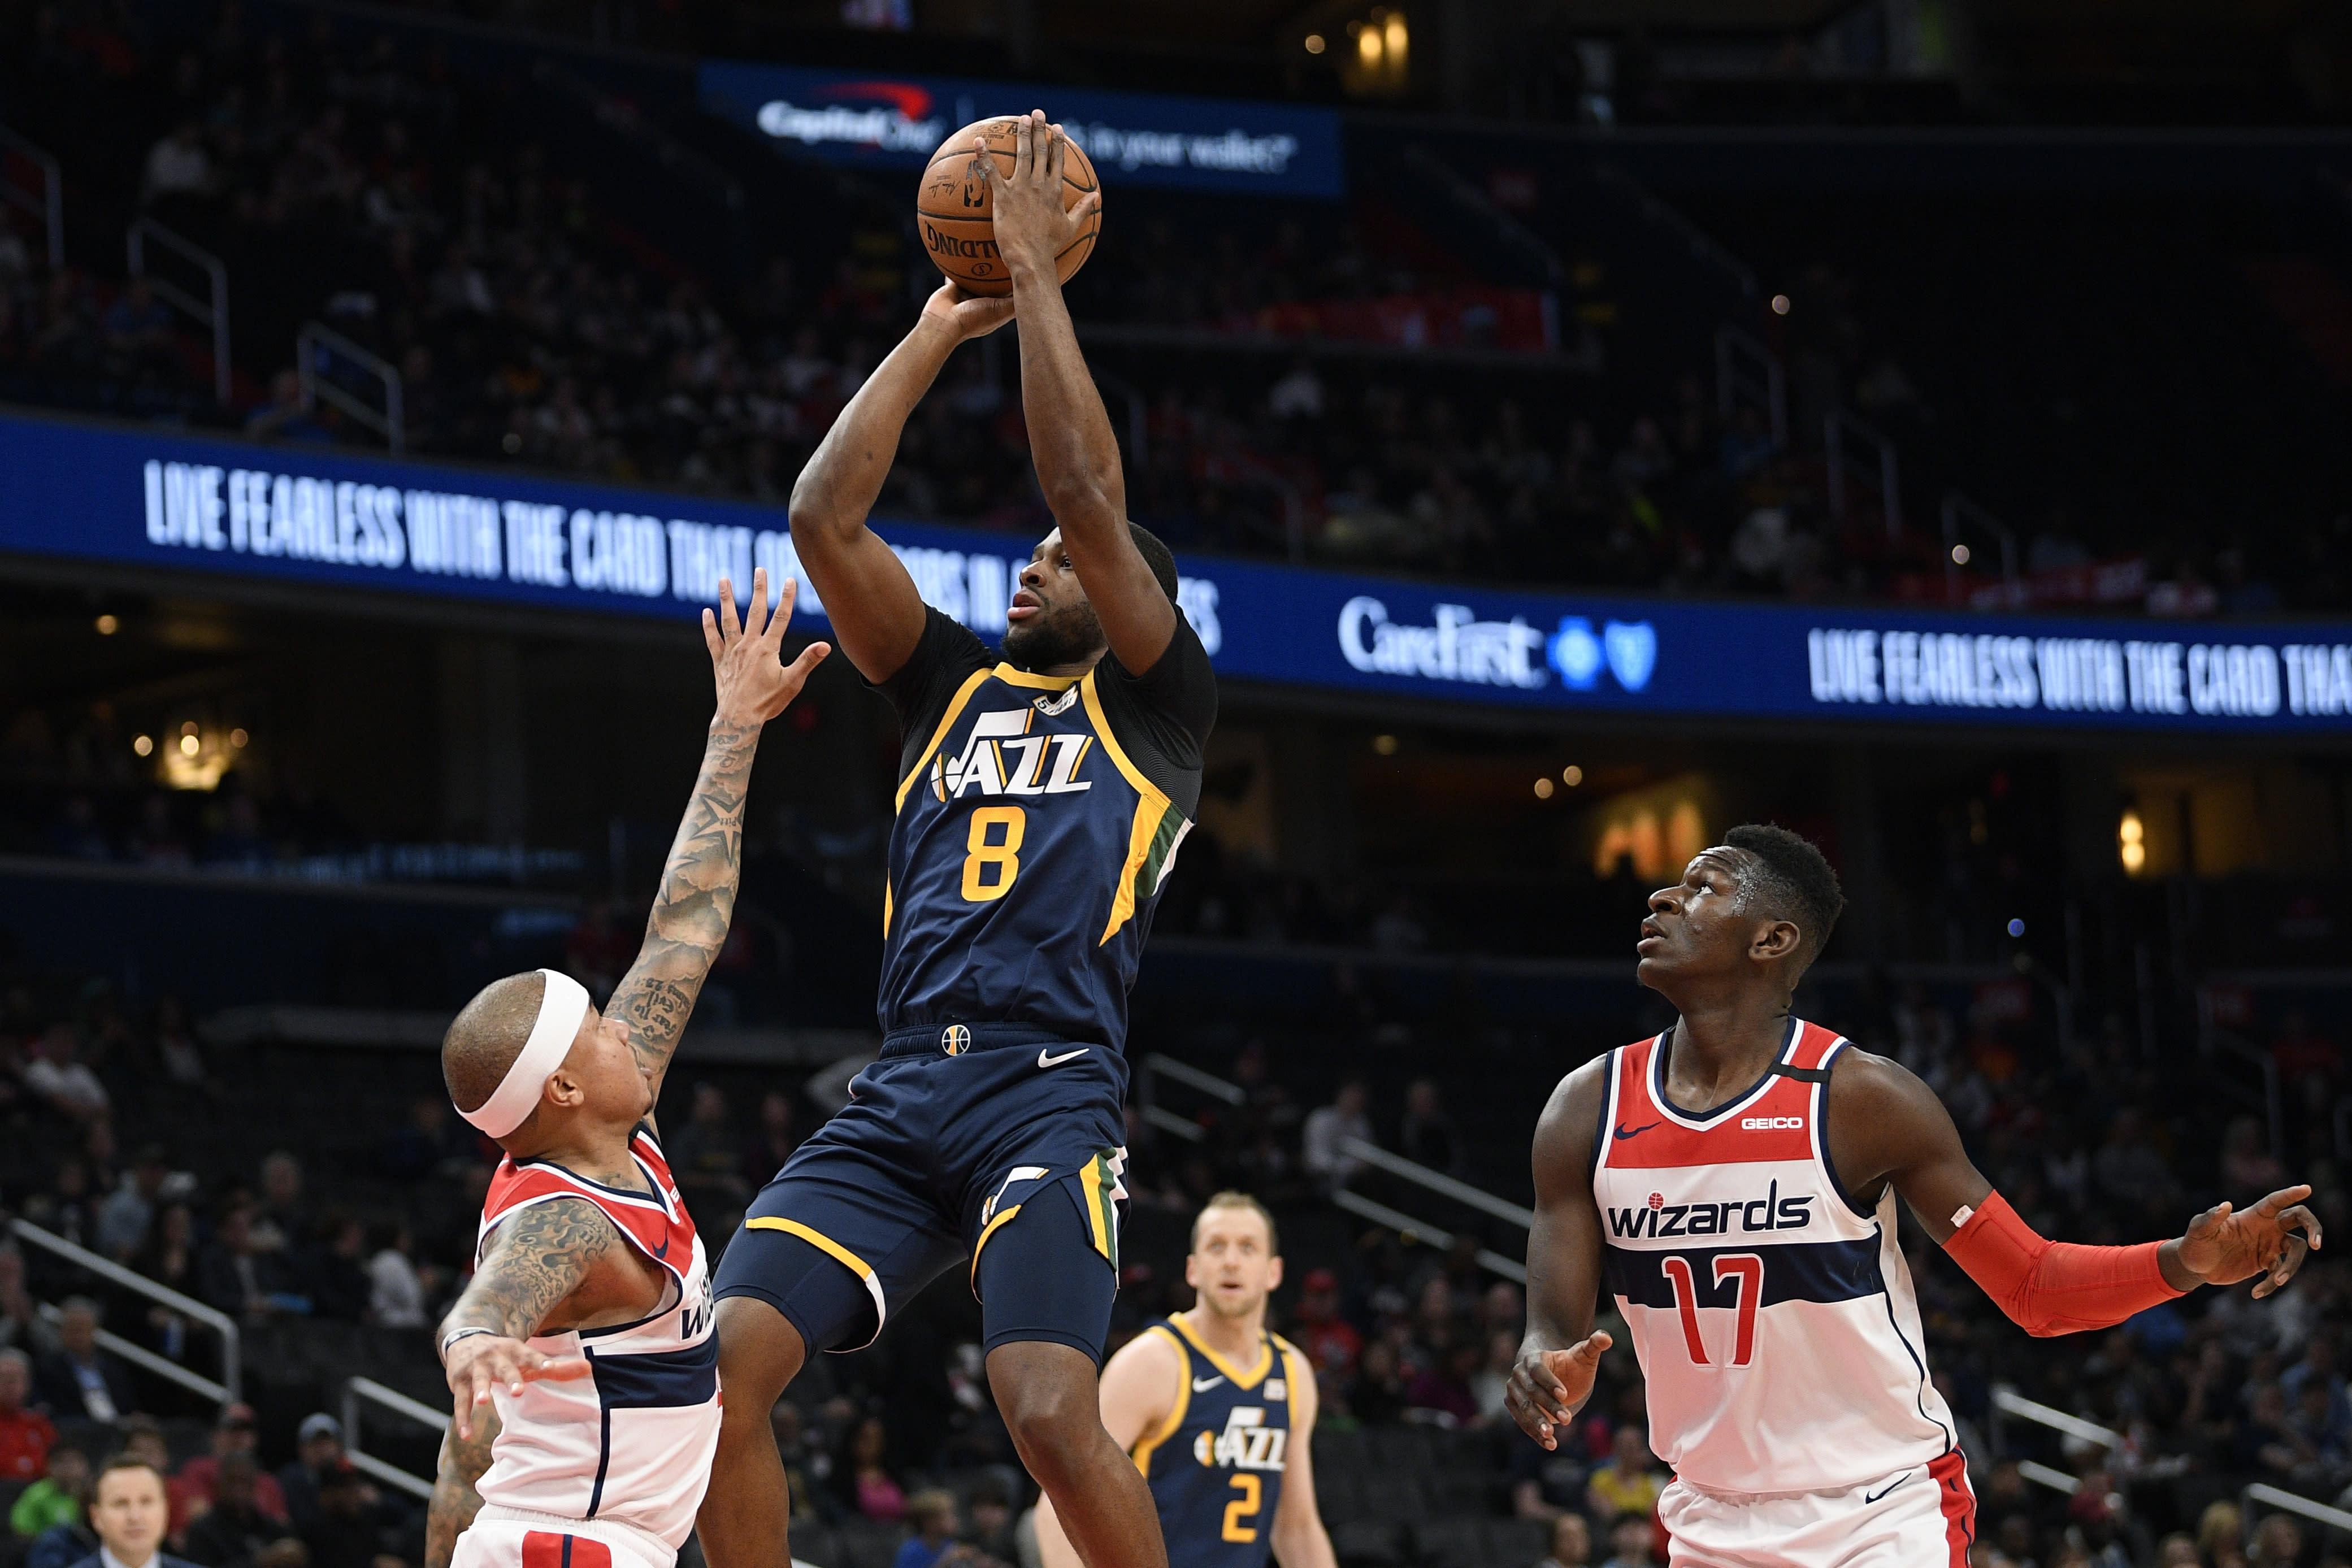 Utah Jazz guard Emmanuel Mudiay (8) shoots between Washington Wizards guards Isaiah Thomas, left, and Isaac Bonga (17) during the first half of an NBA basketball game, Sunday, Jan. 12, 2020, in Washington. (AP Photo/Nick Wass)